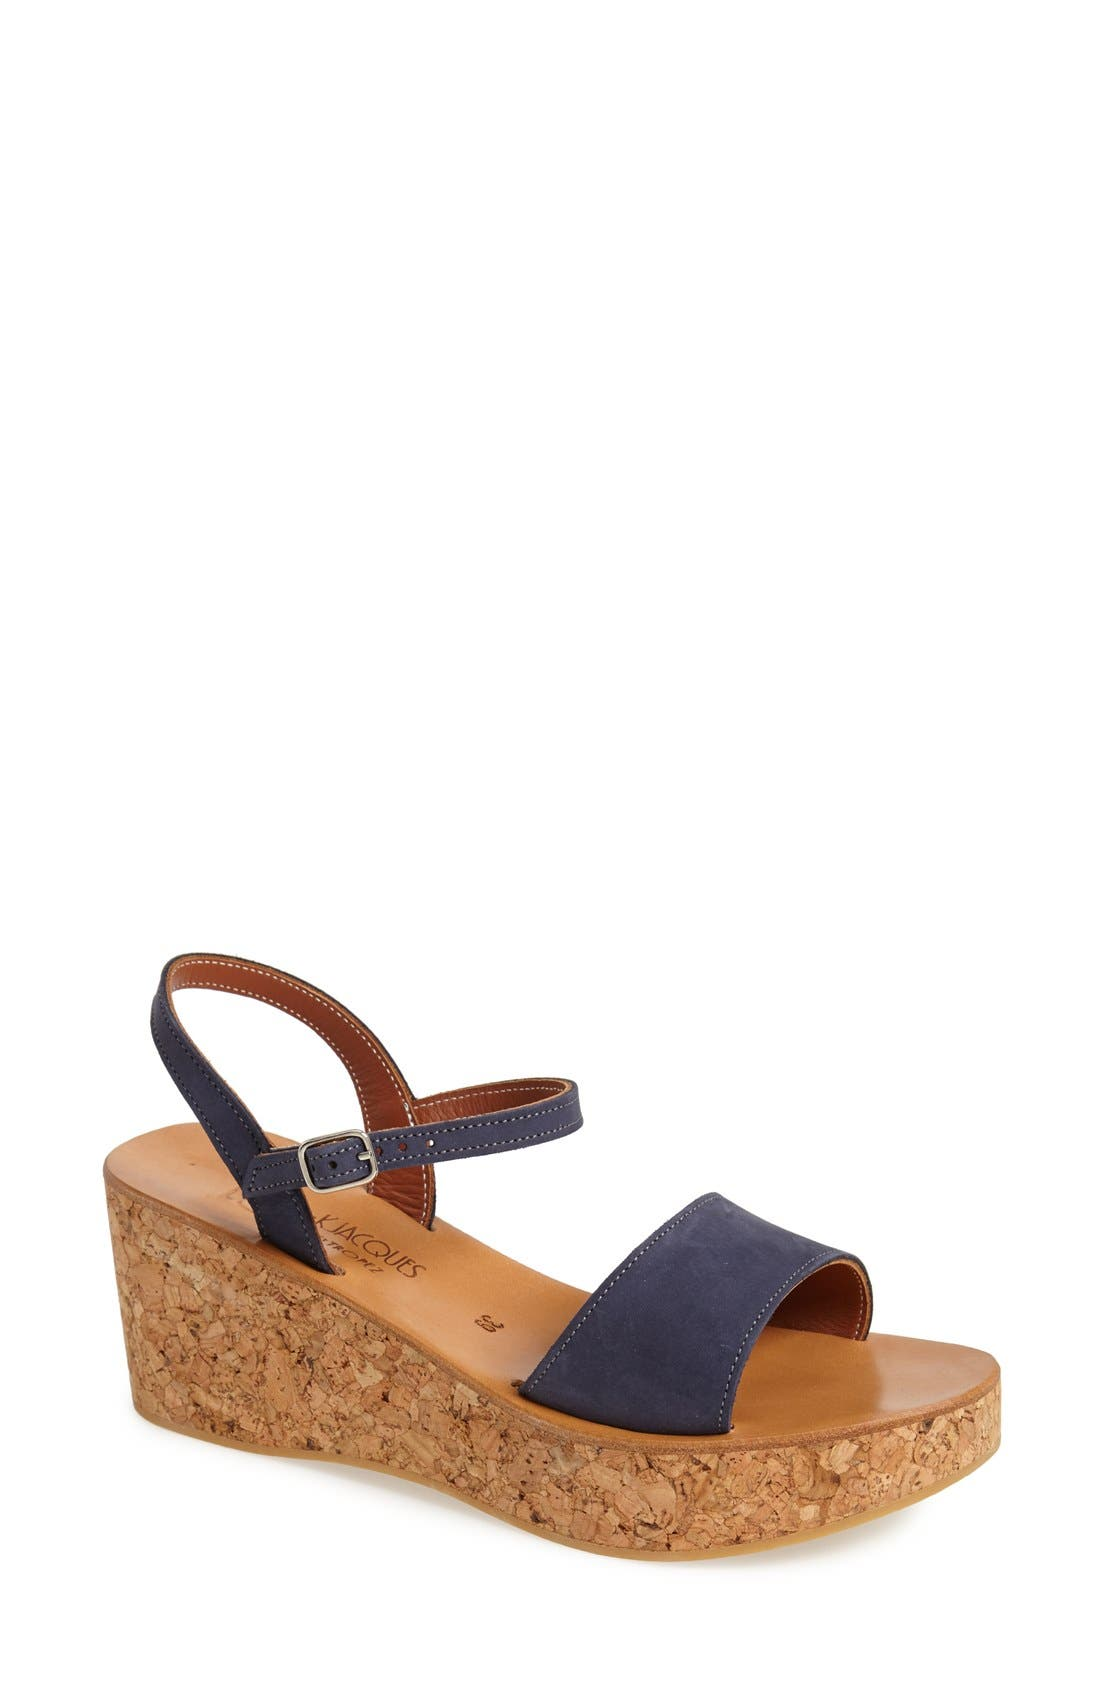 Alternate Image 1 Selected - K.Jacques St. Tropez Ankle Strap Wedge Sandal (Women)